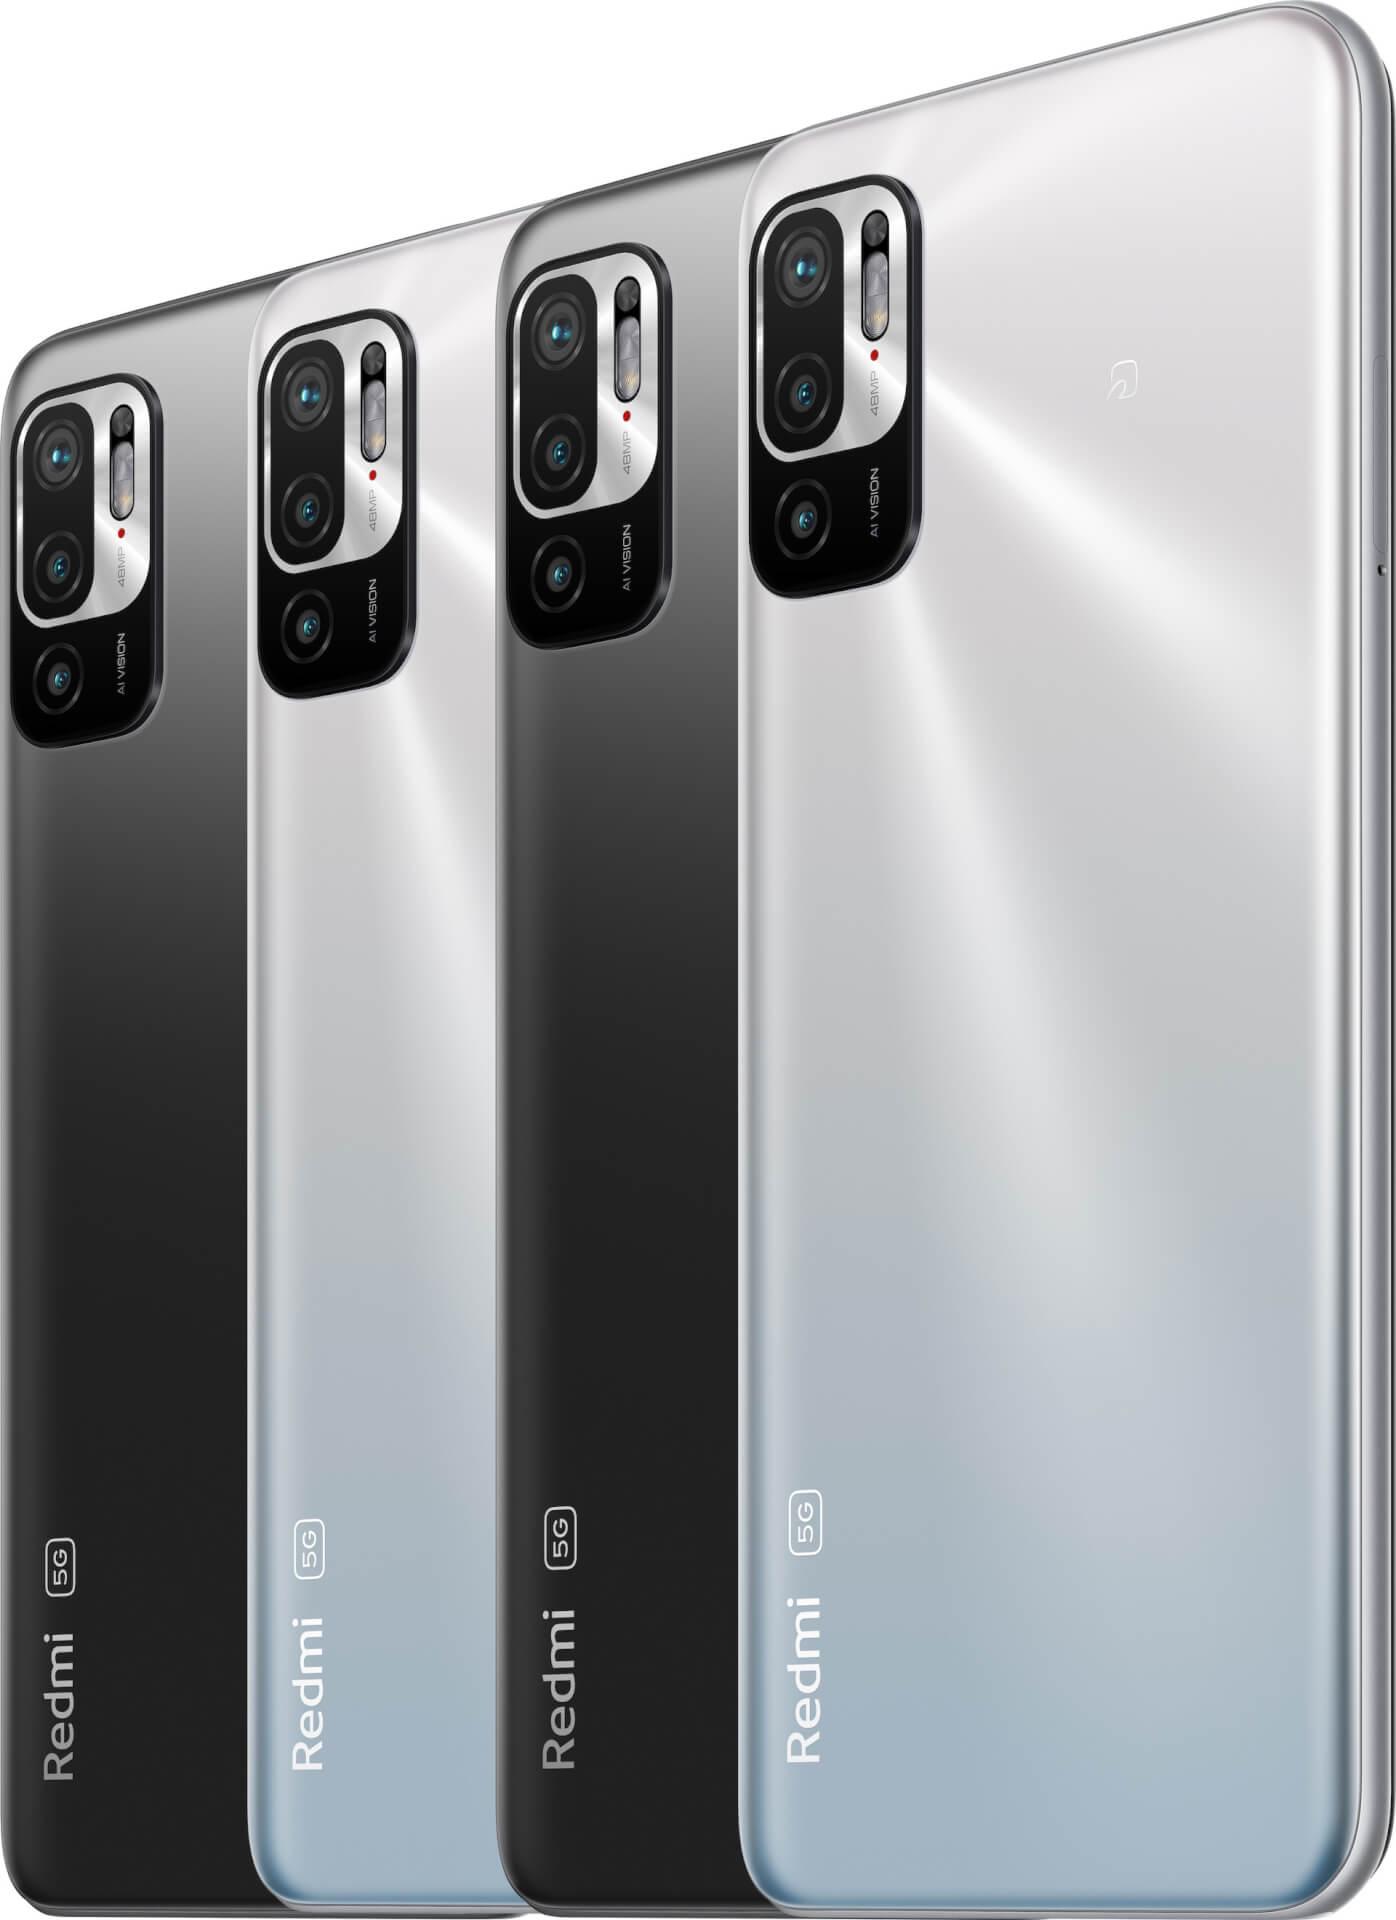 Xiaomiから初の日本独自モデルの5Gスマホ『Redmi Note 10 JE』が発売決定!AI顔認証、側面指紋認識センサーも搭載 tech210802_xiaomi_5g_9